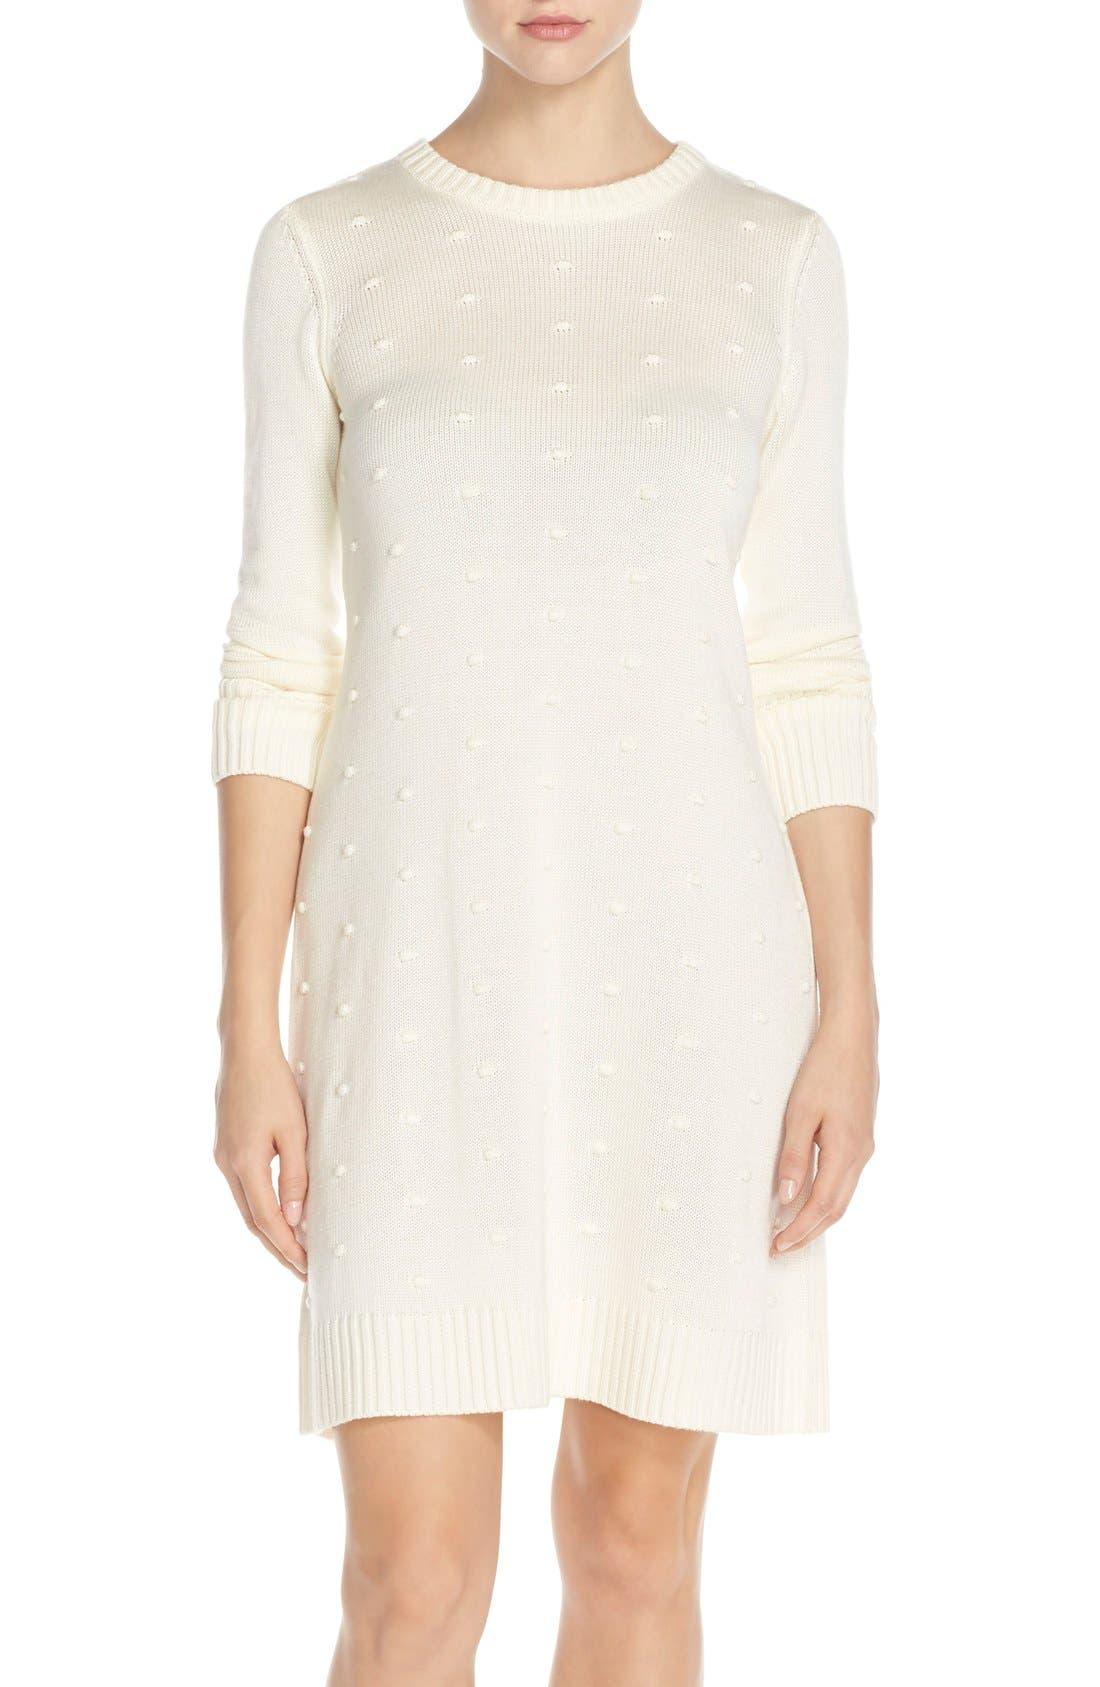 Alternate Image 1 Selected - Eliza J NubbyKnit Shift Sweater Dress